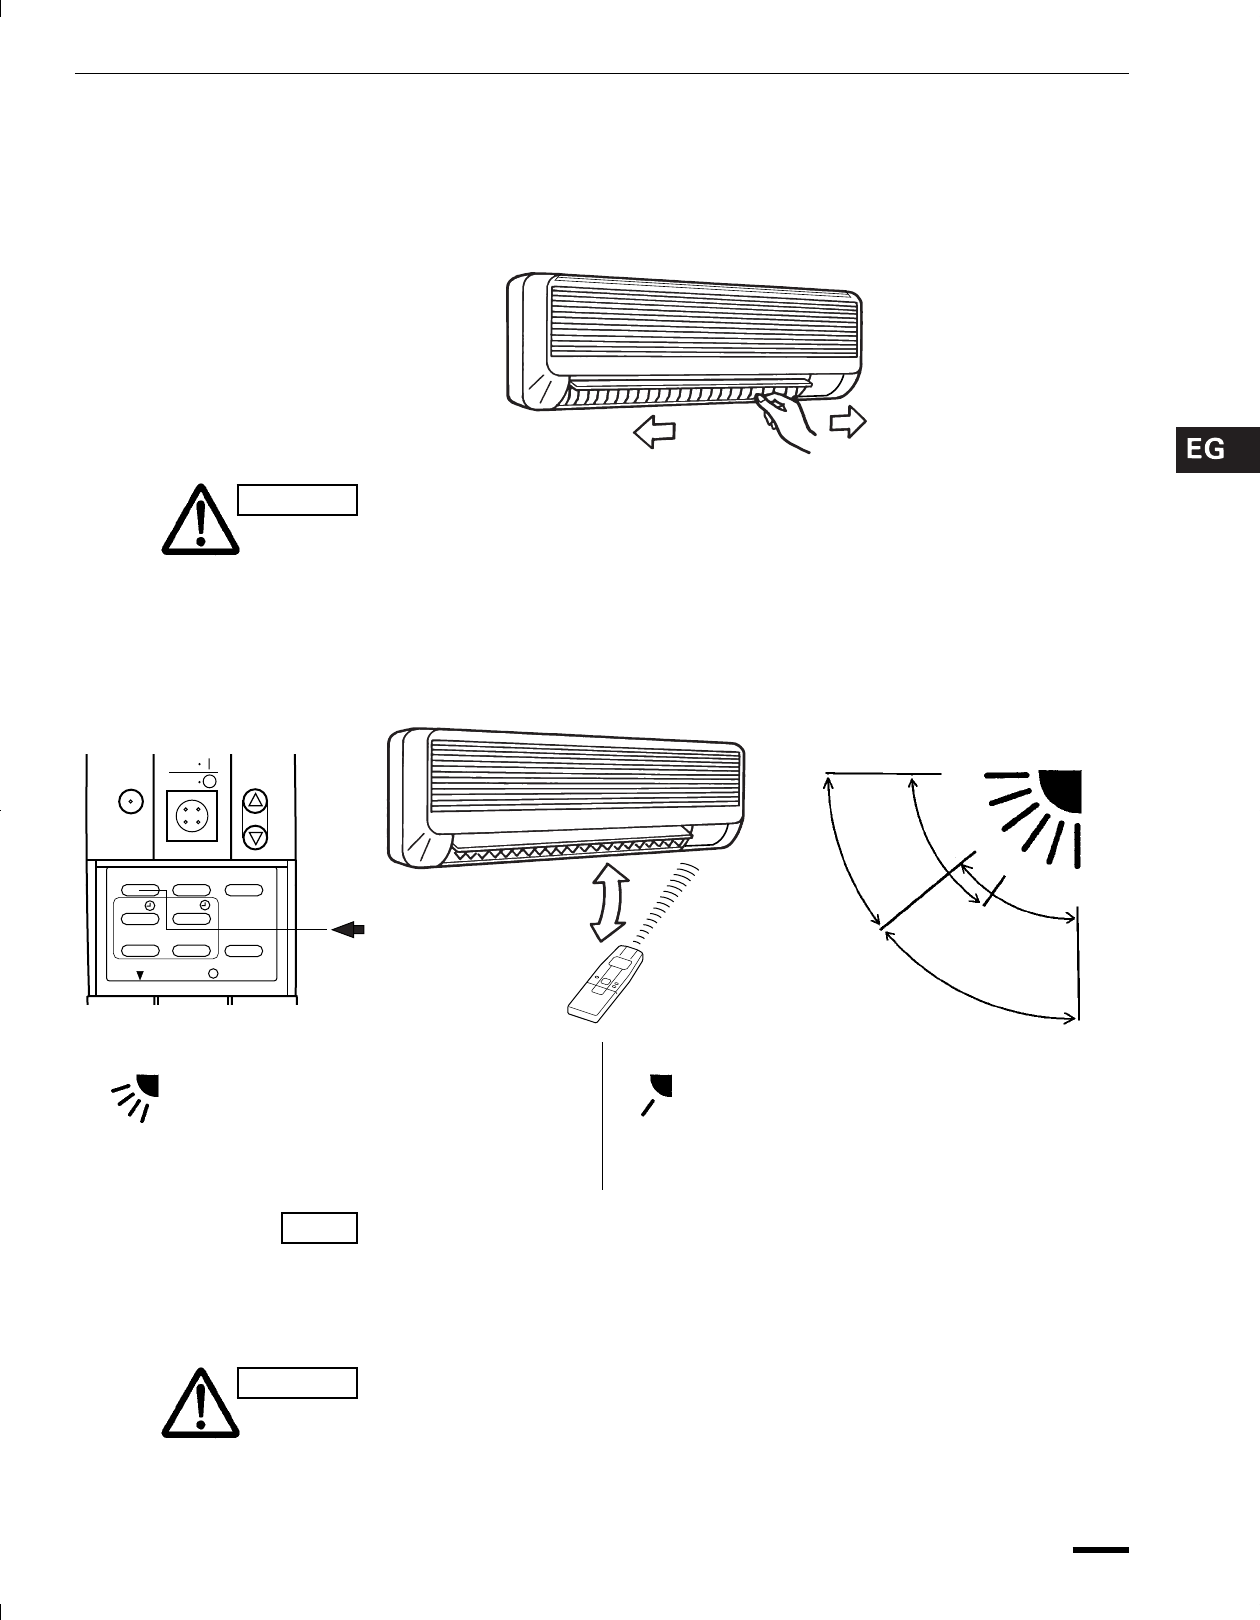 Sanyo Cg1411 Users Manual 098 308 SM (1 15)